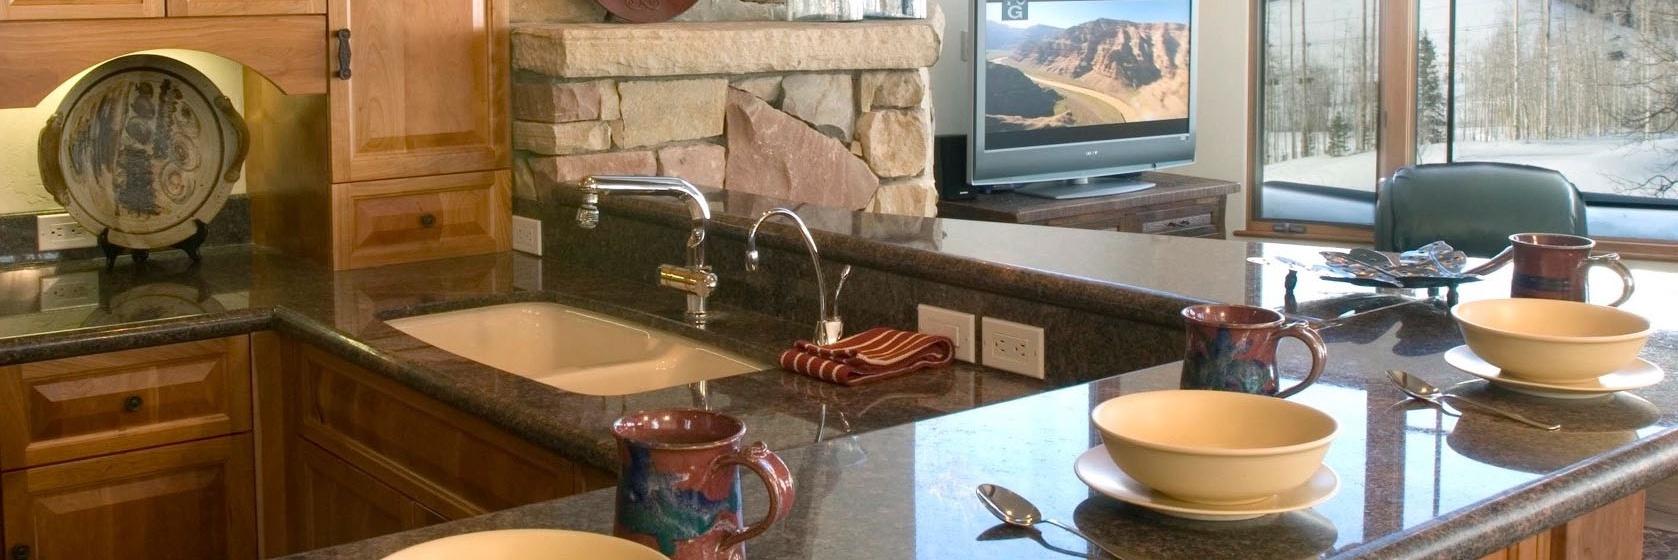 7-MountainVillage-PineMeadows138-Kitchen2-V12.jpg